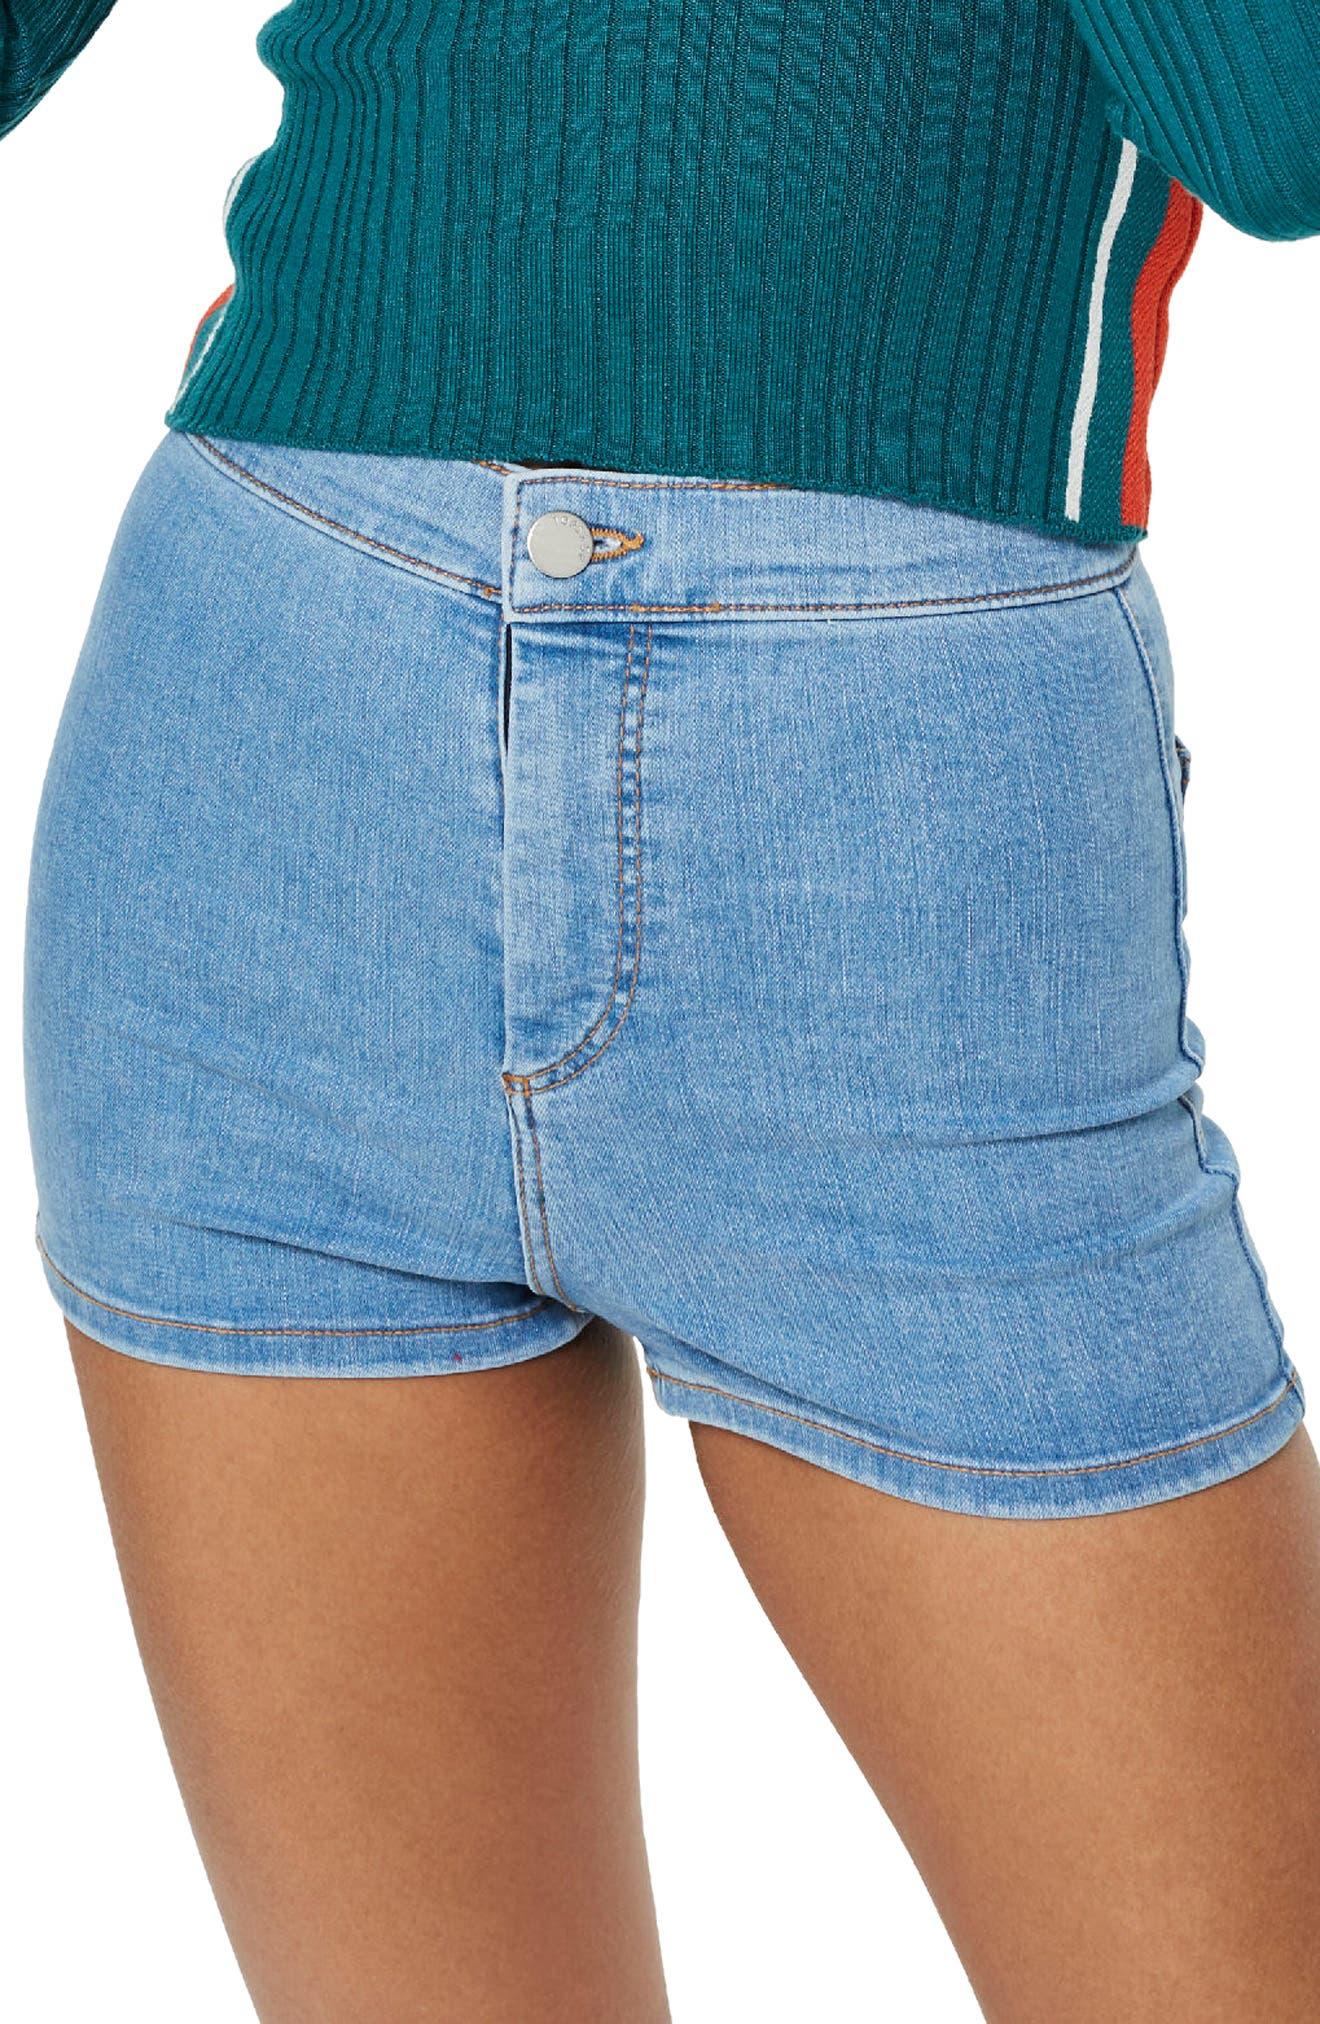 Joni Light Denim High Waist Shorts,                             Main thumbnail 1, color,                             Light Denim